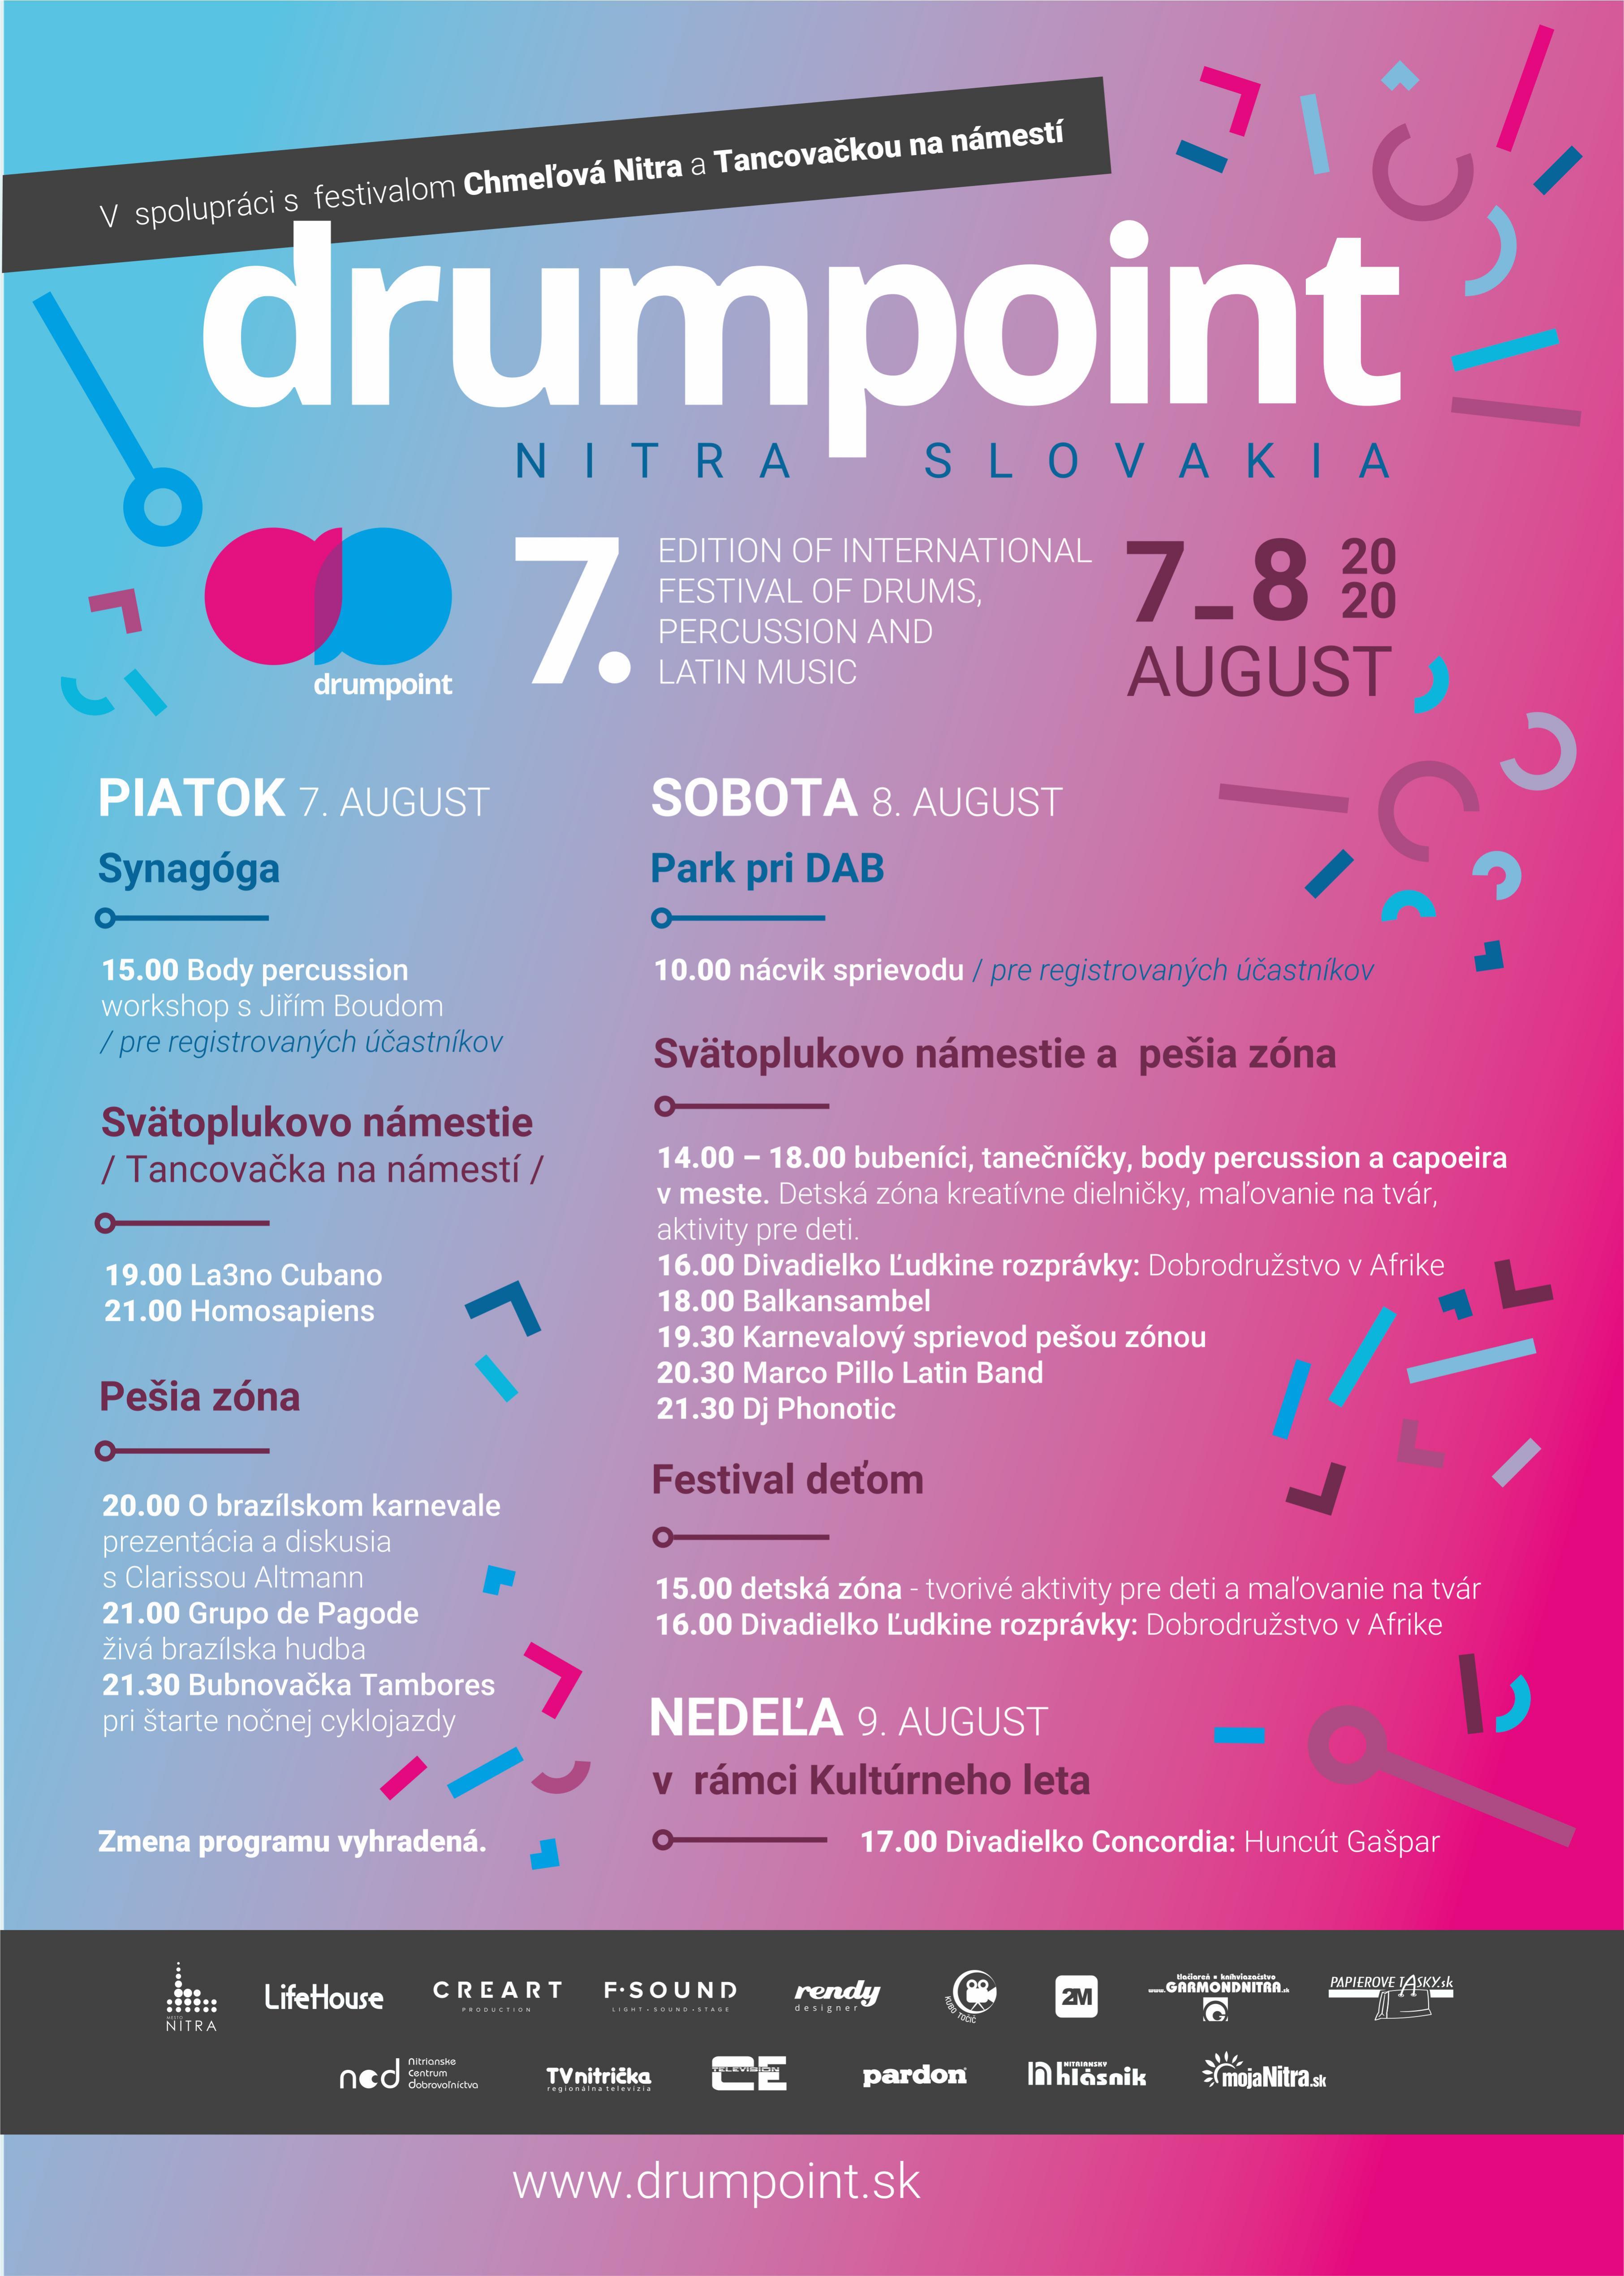 drumpoint 2020 nitra program